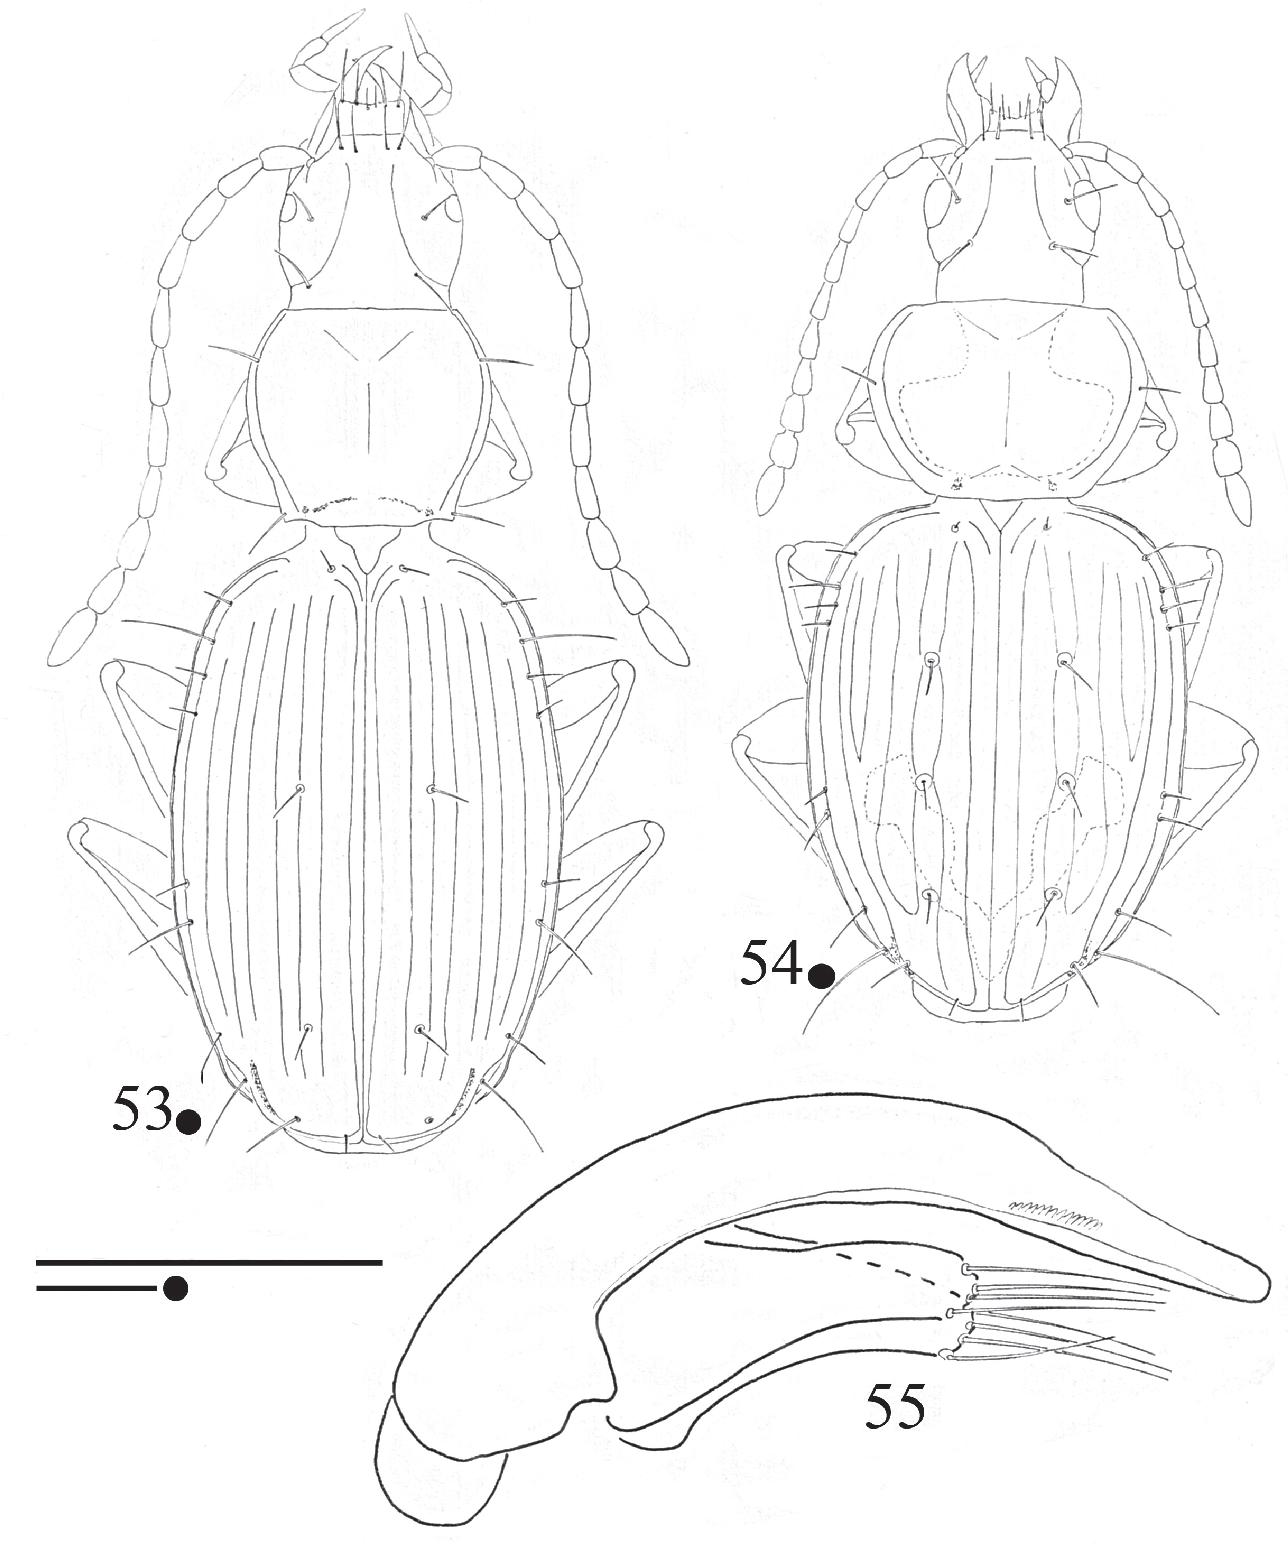 figure 53-55